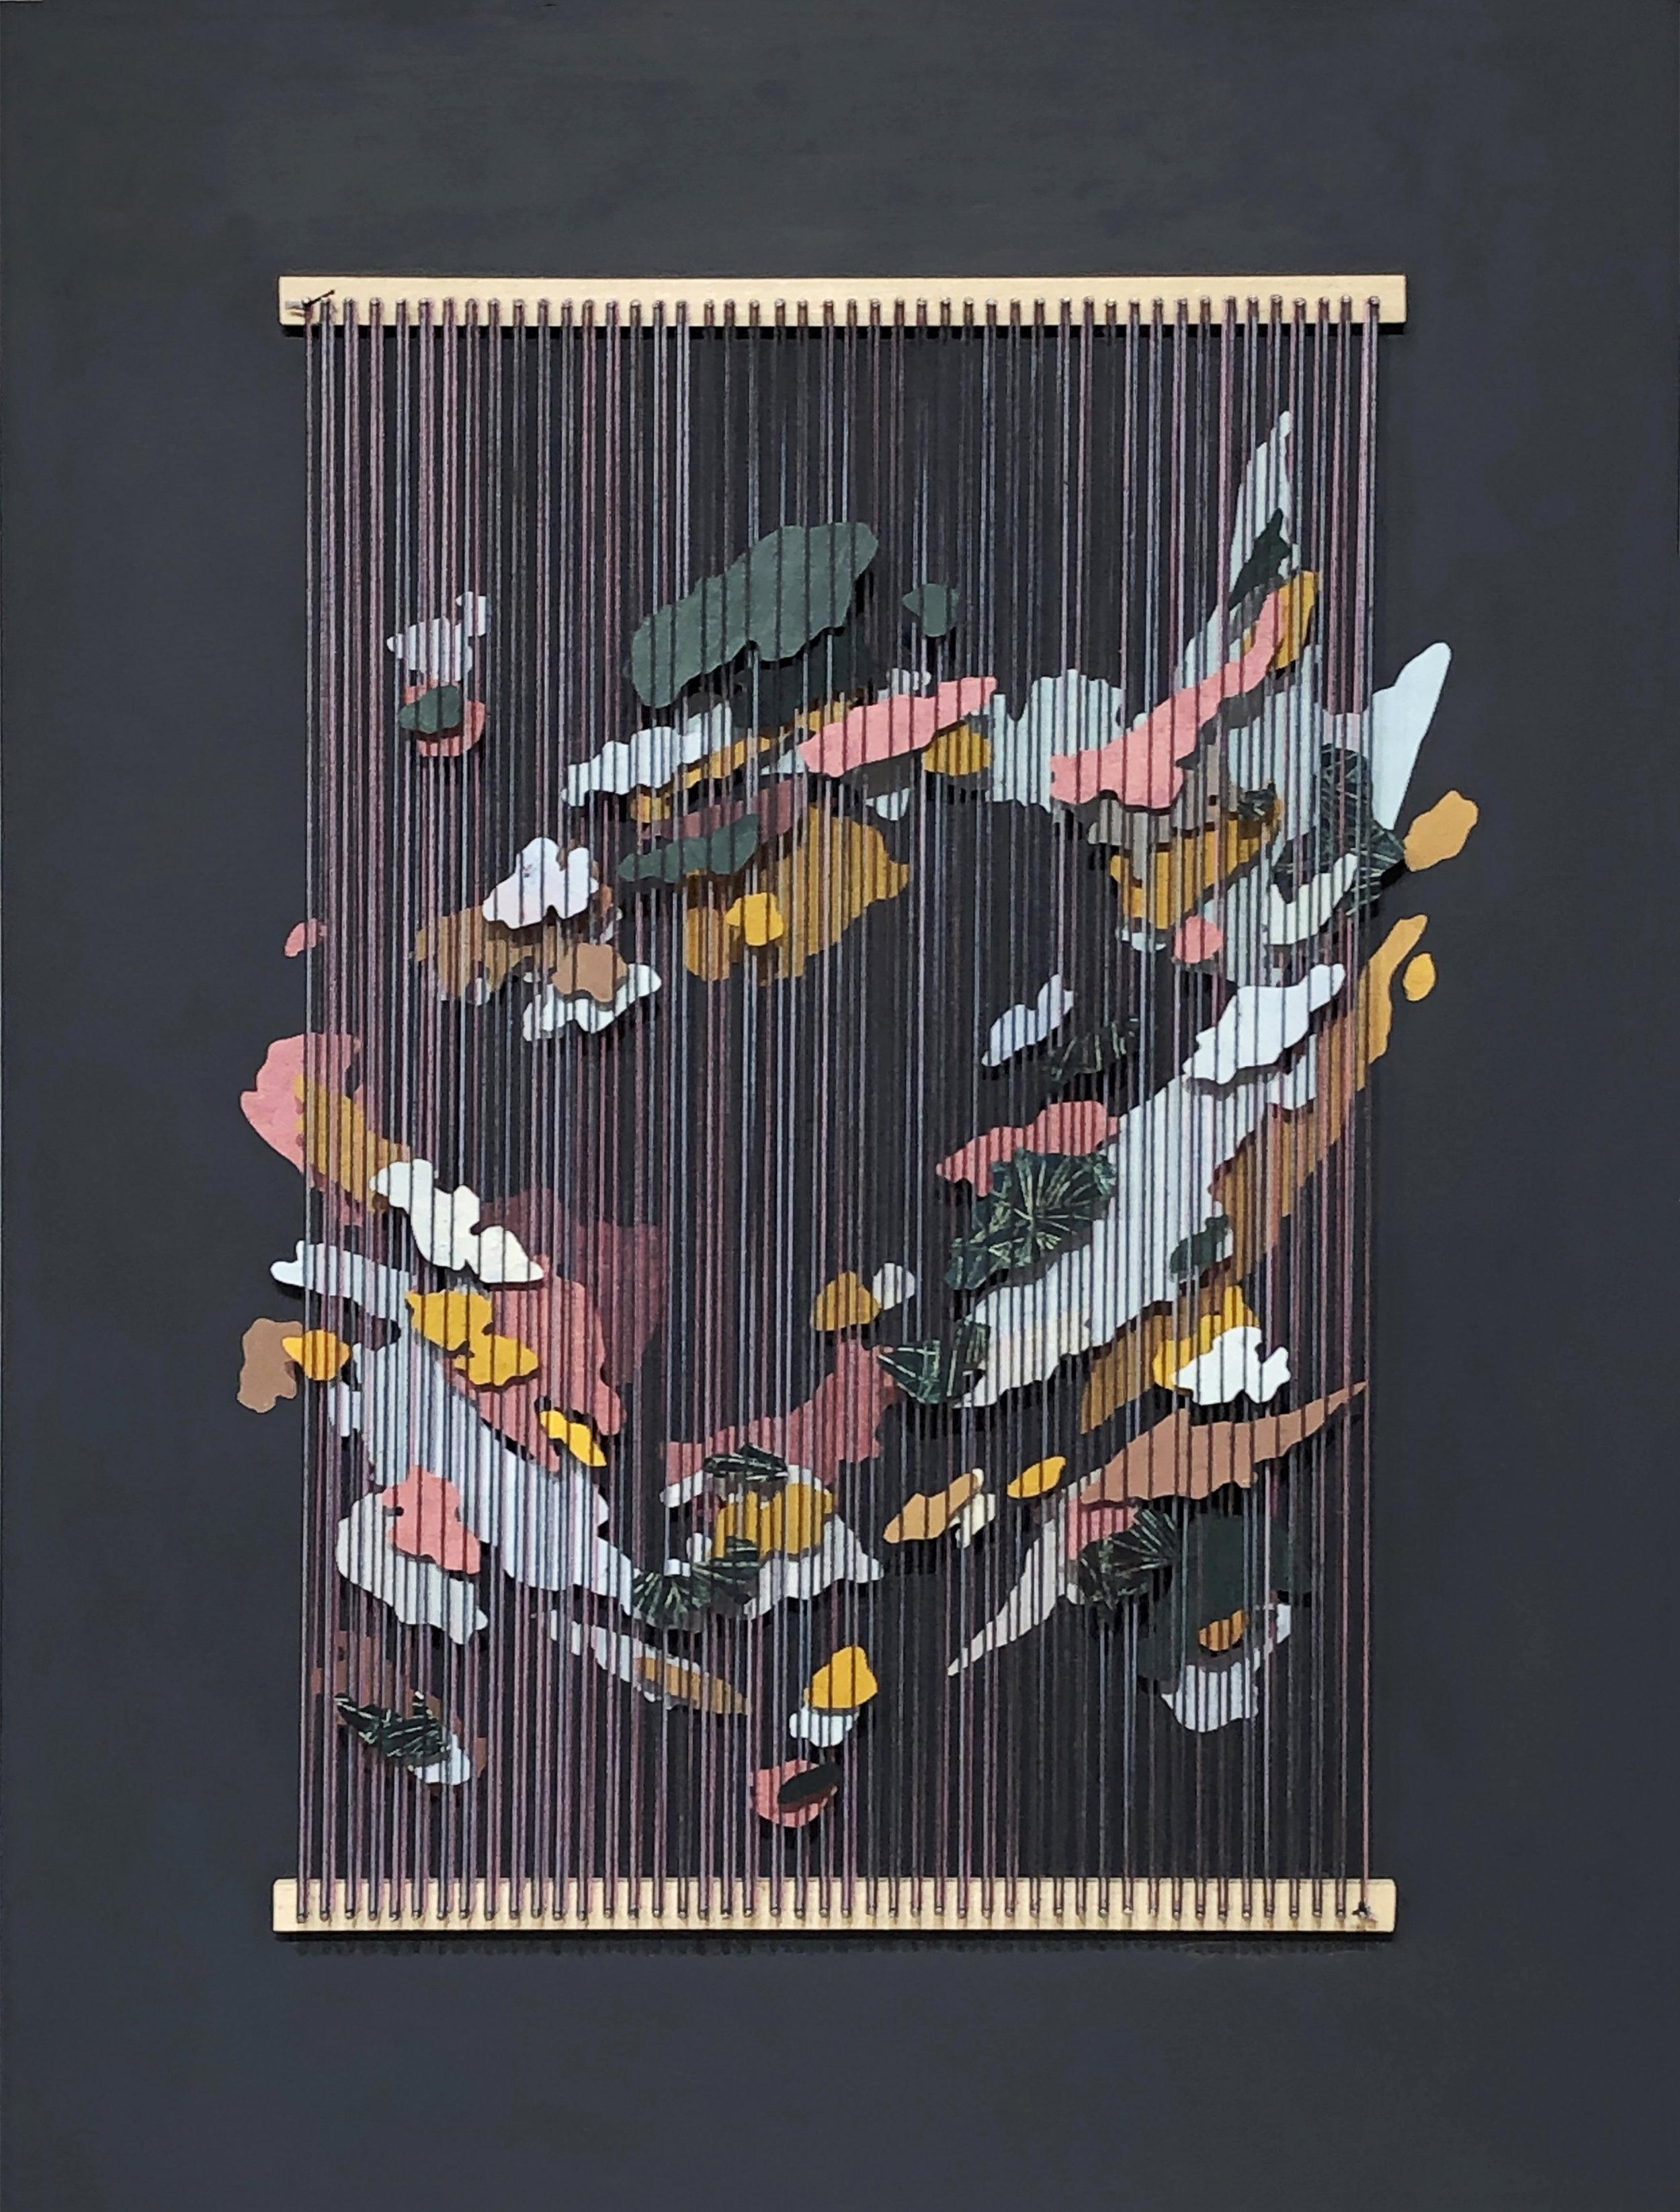 Tegan Brozyna Roberts,  Blönduós V , 2019, Painted paper, thread, nails and wood, 24 1/2 x 18 3/4 inches